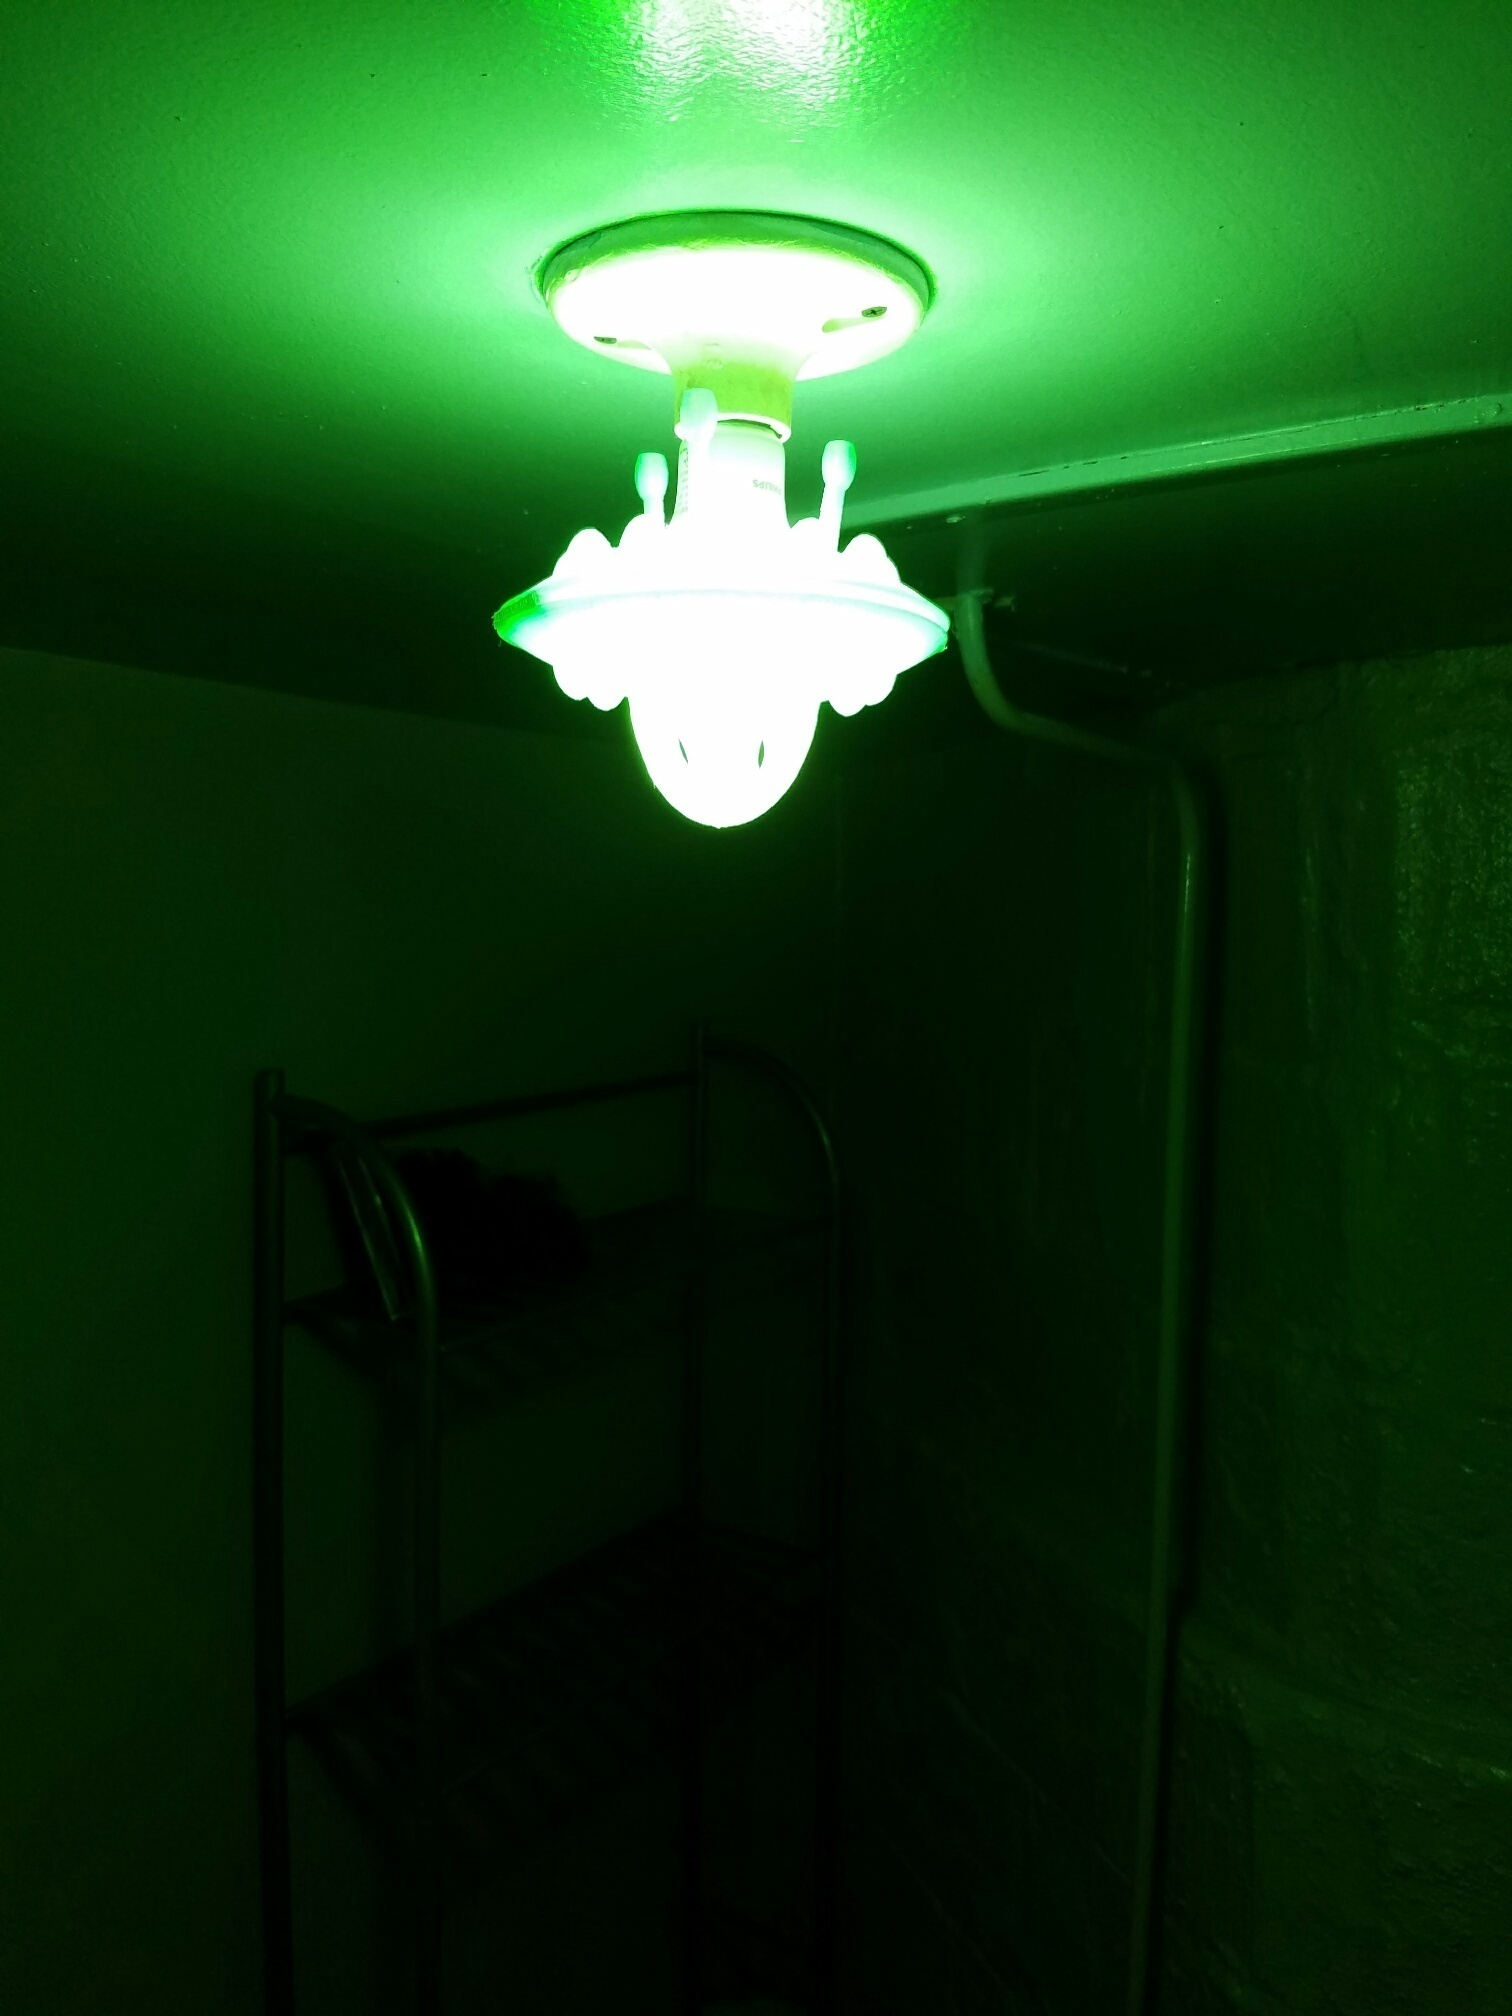 3d printed flying saucer led lightbulb fixture by sonny rivas 3d printed flying saucer led lightbulb fixture by sonny rivas pinshape arubaitofo Images